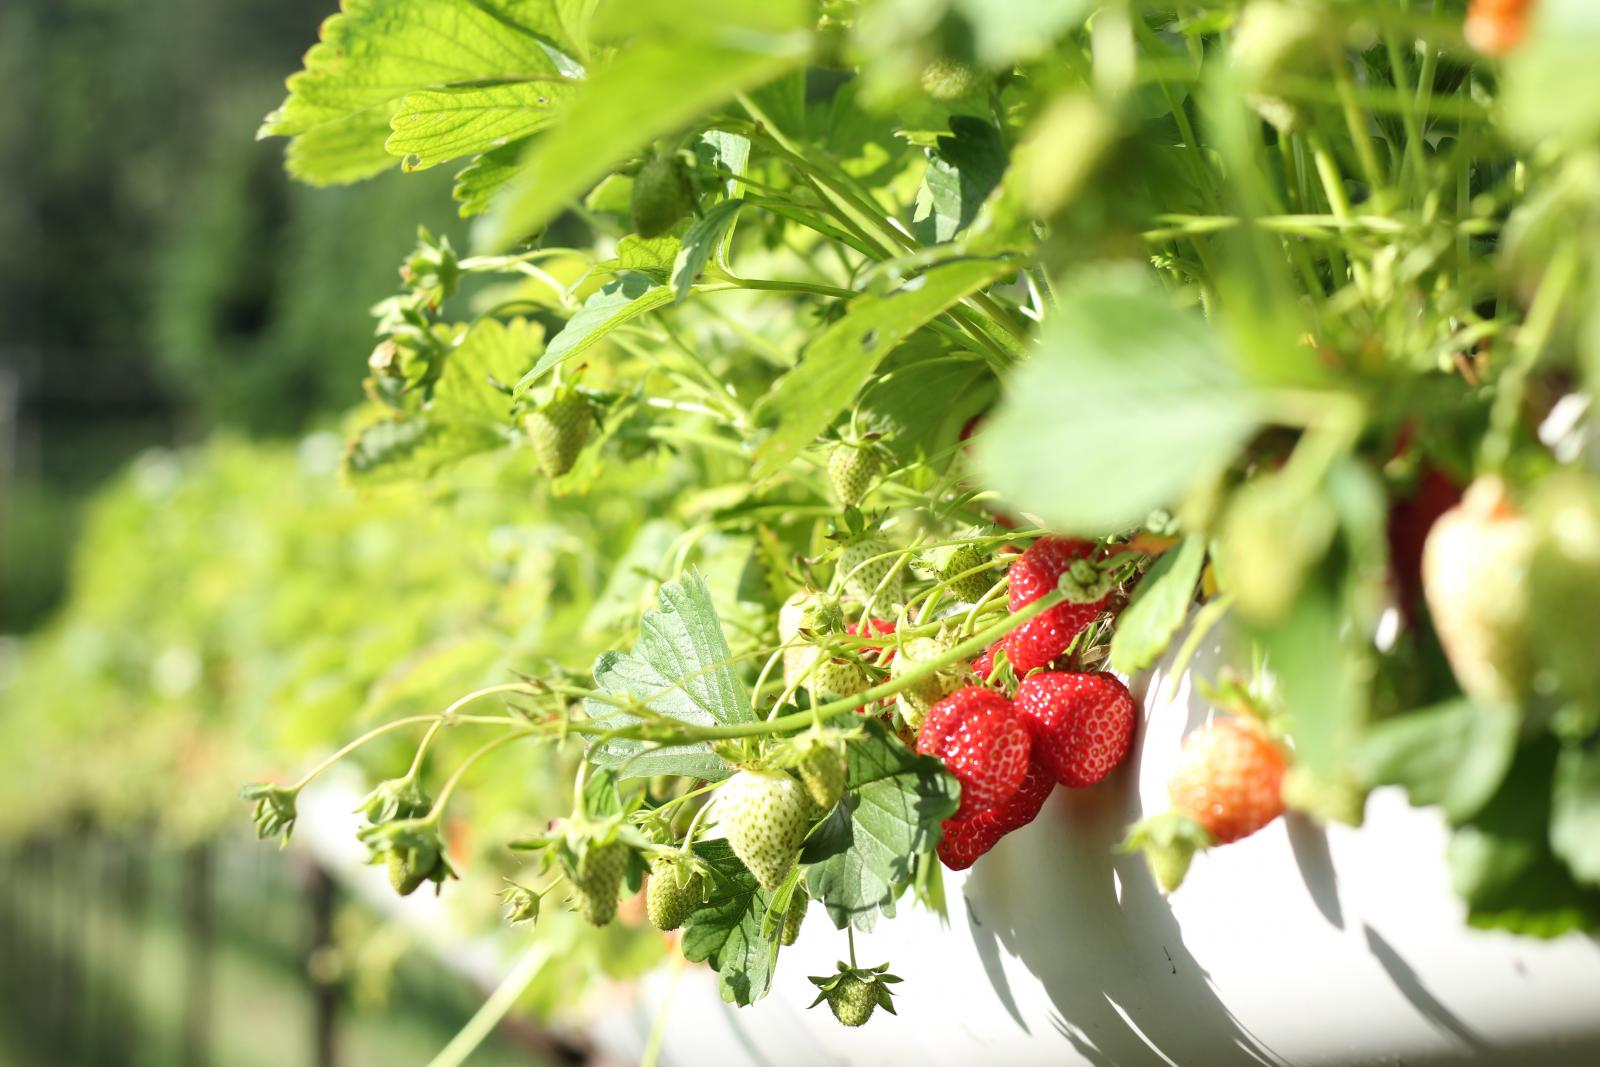 Strawberries. Photo credit: Pexels